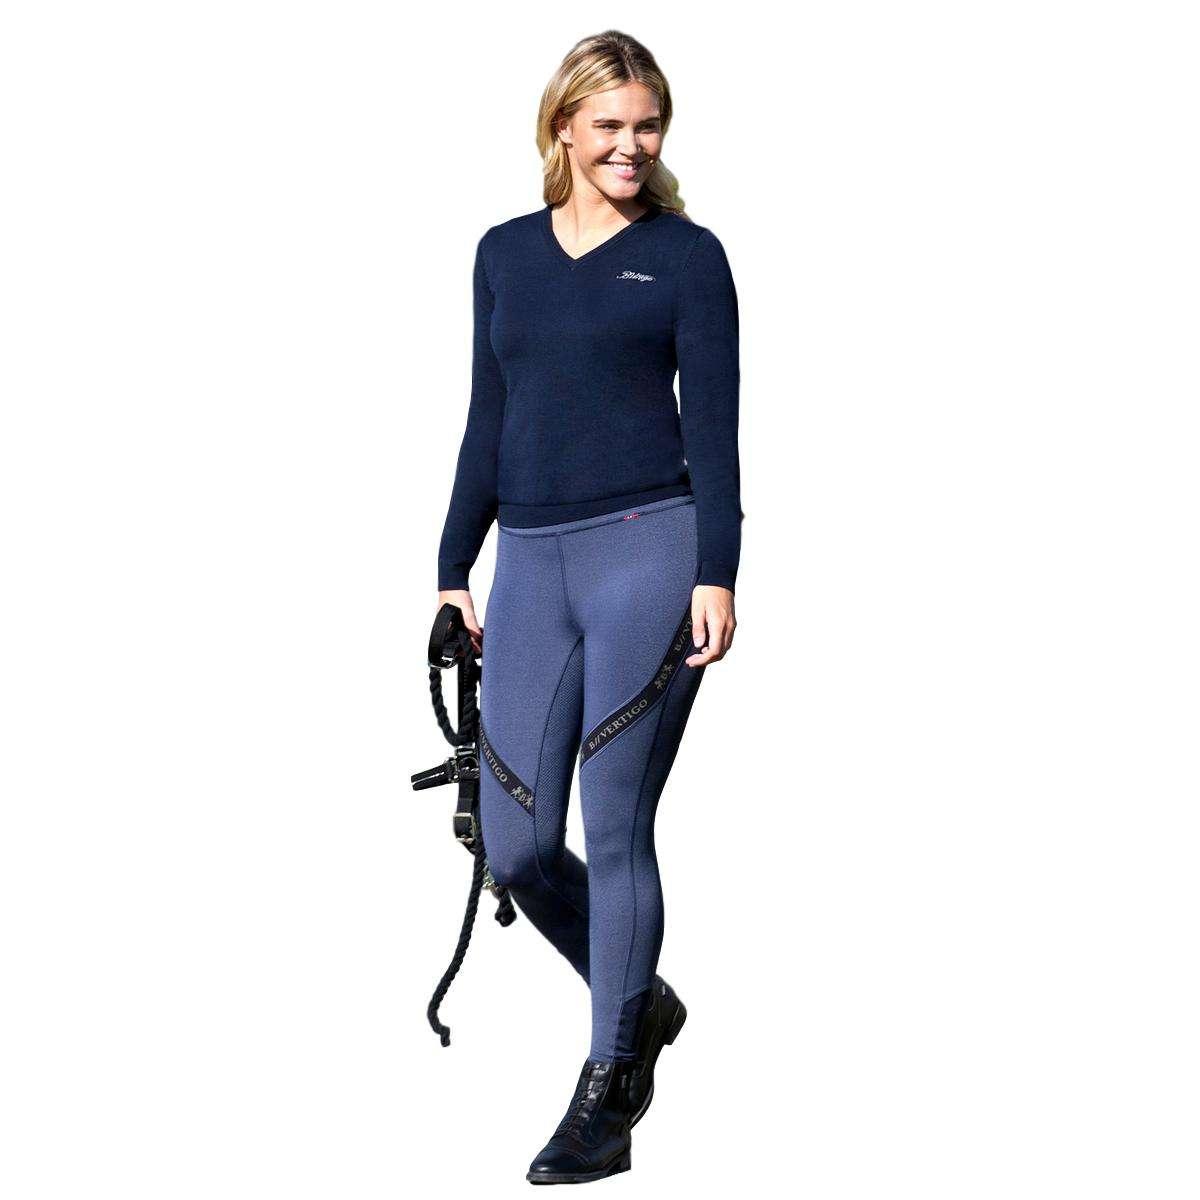 B Vertigo Jenny Ultra Comfort Quick Dry Women/'s Silicone Full Seat Riding Tights